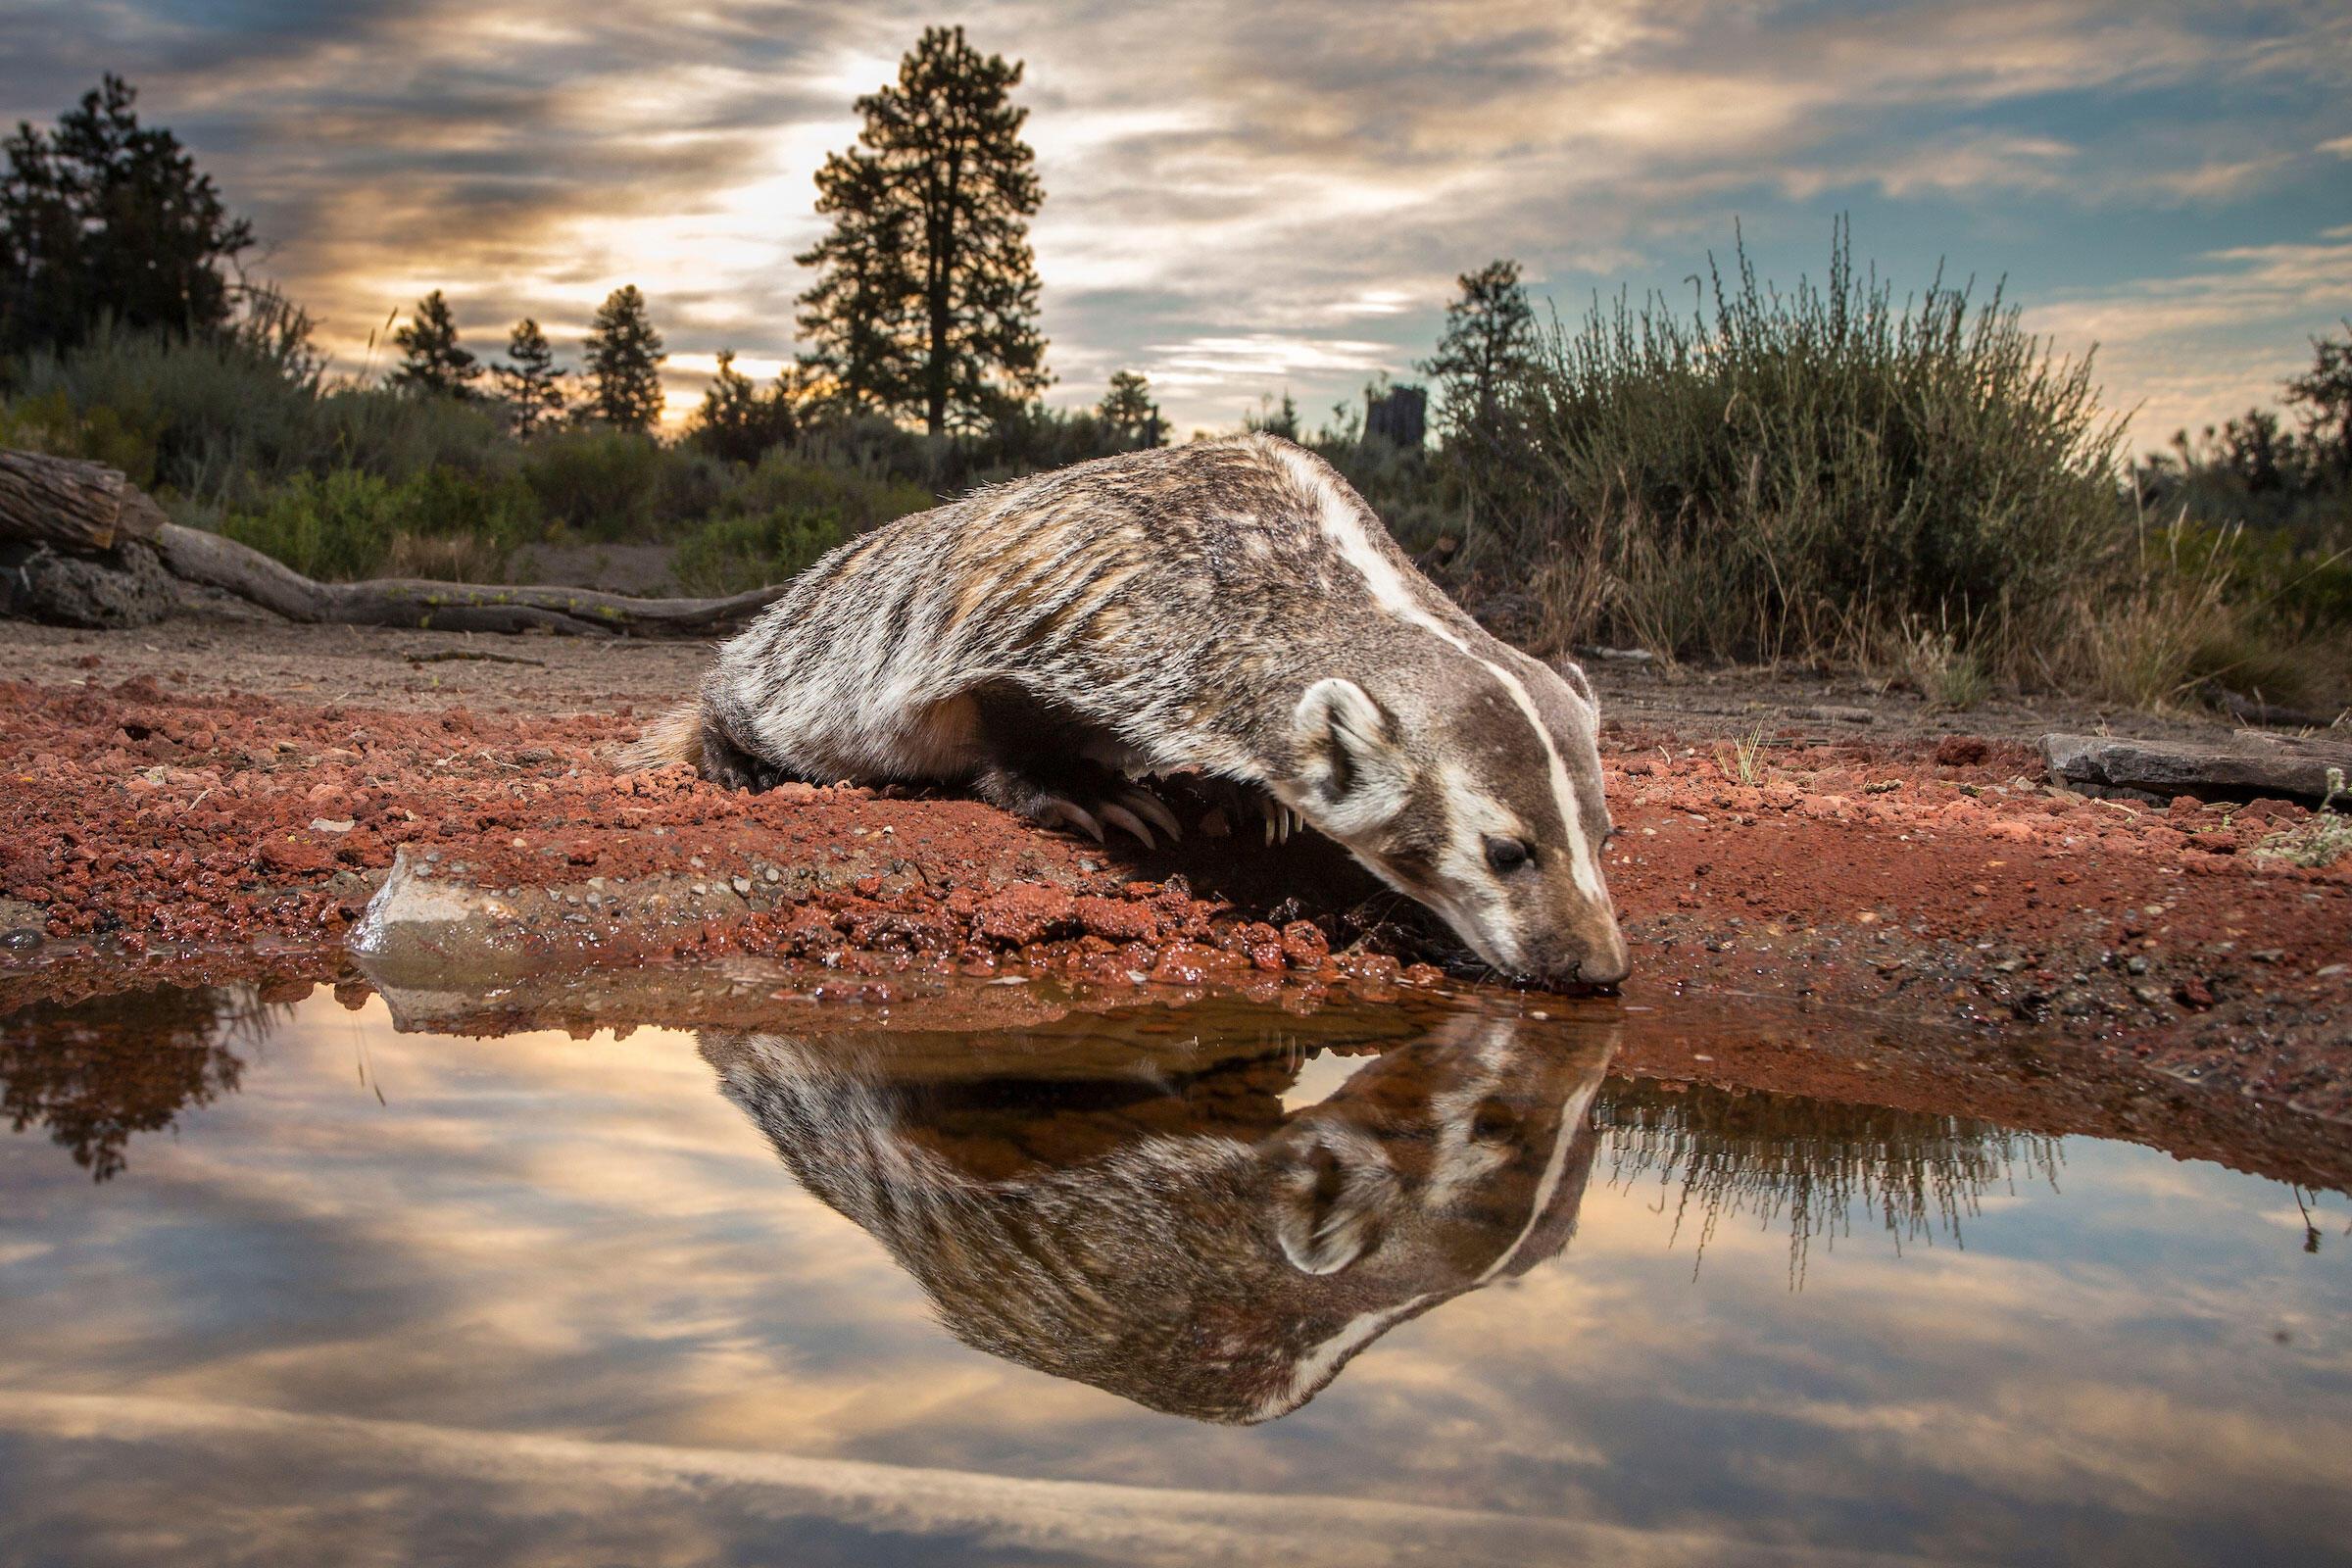 "An American badger takes a drink after sunrise. <a href=""http://www.durmphoto.com/index"">Michael Durham</a>"